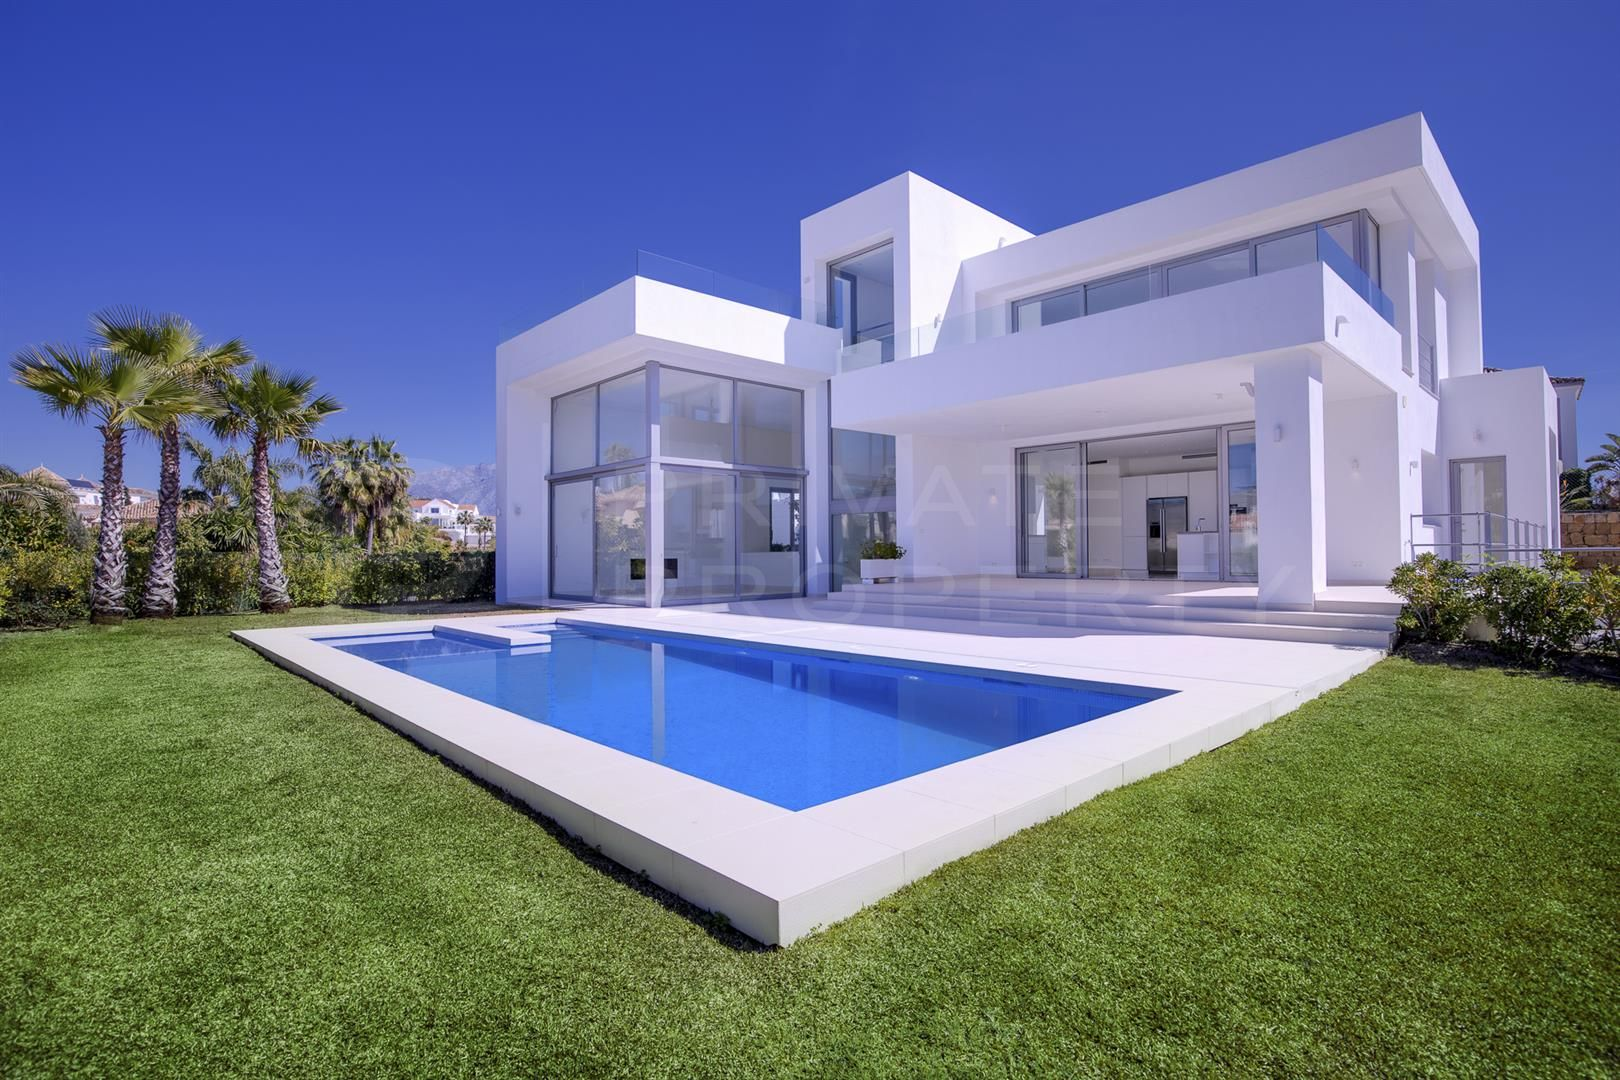 Modern villa in El Capitan, Benahavis